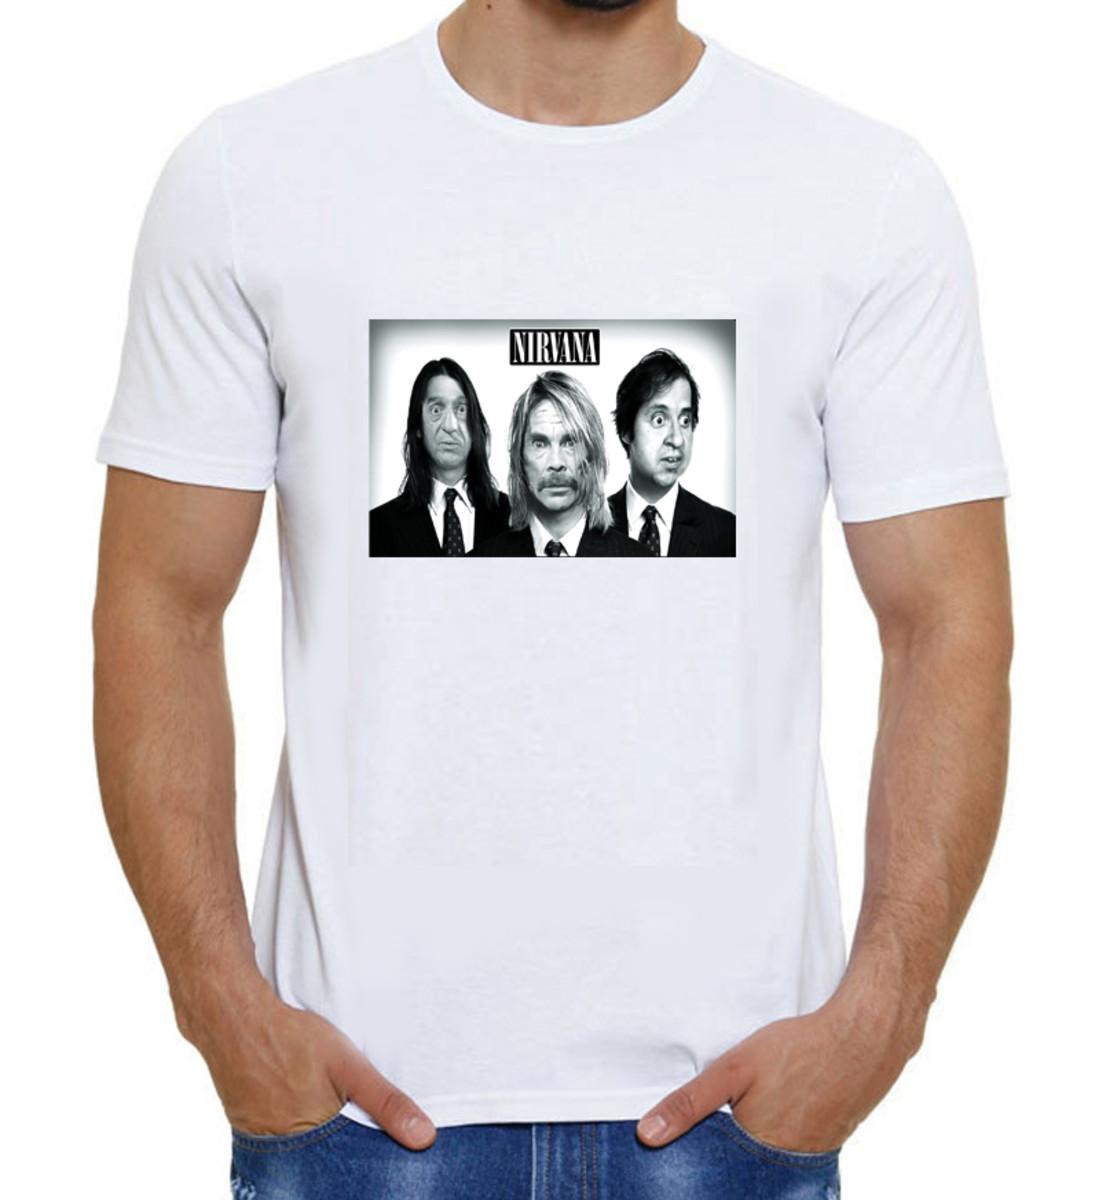 Camiseta Turma Do Chaves Meme Banda Nirvana Grunge no Elo7 ... 927c741475c